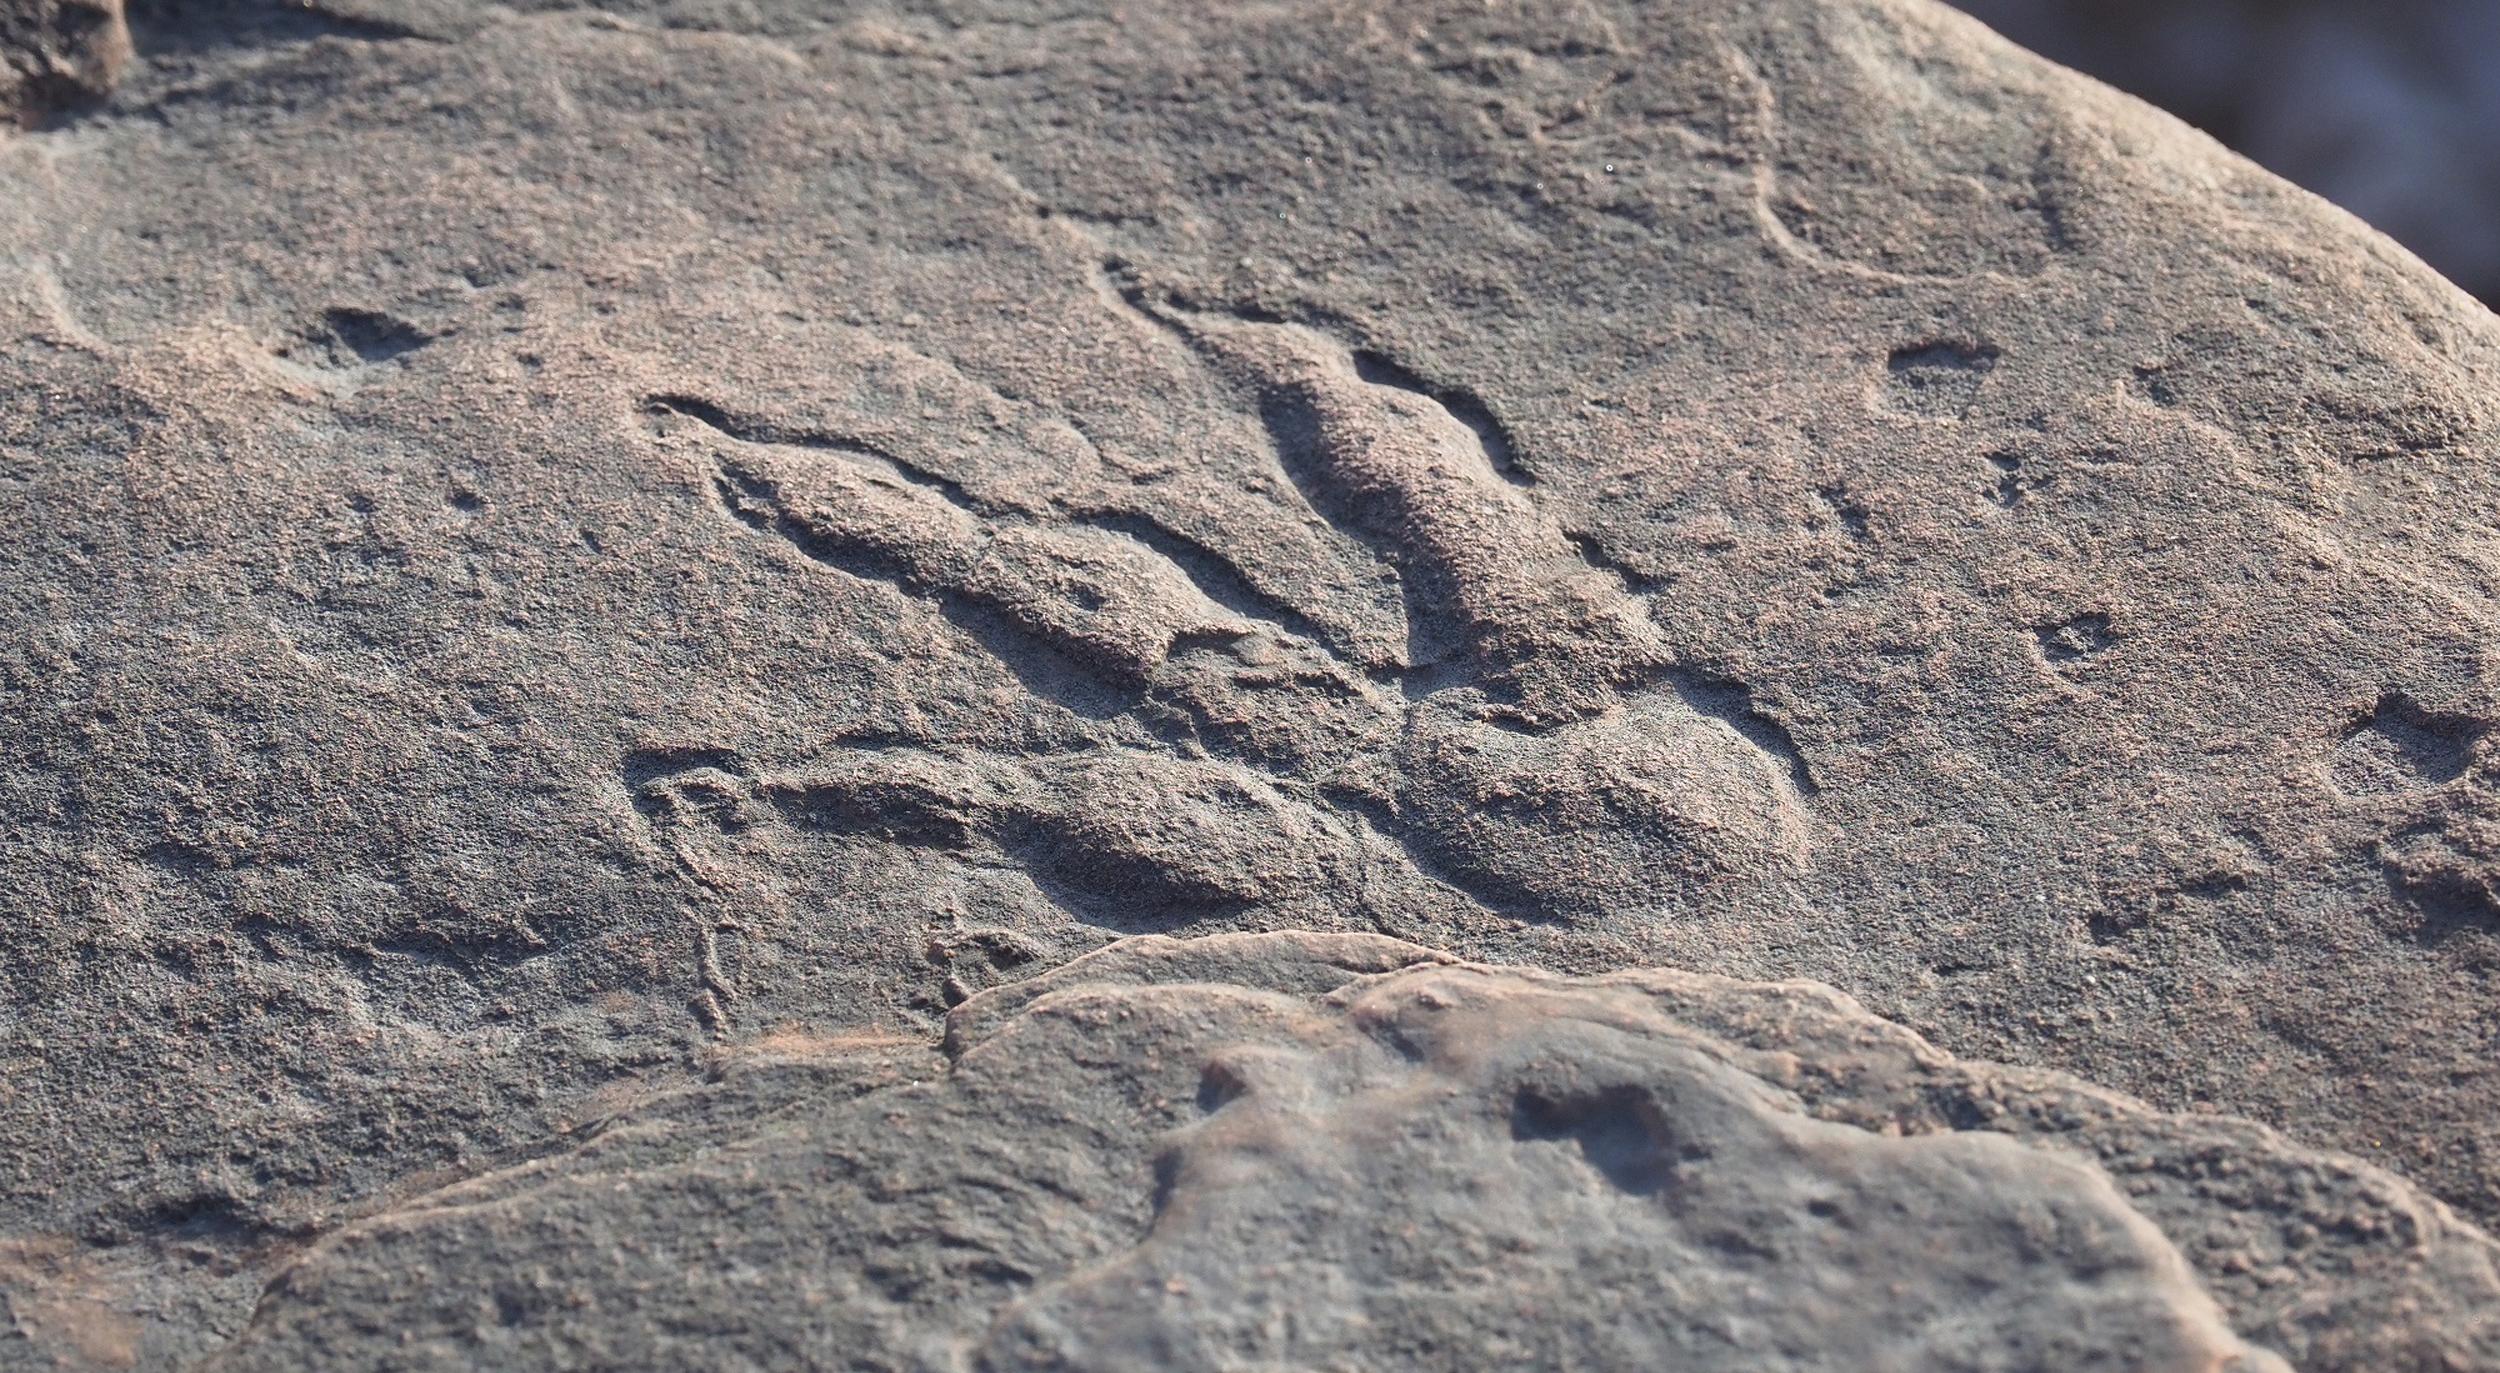 210130-grallator-footprint-al-0939_ab778